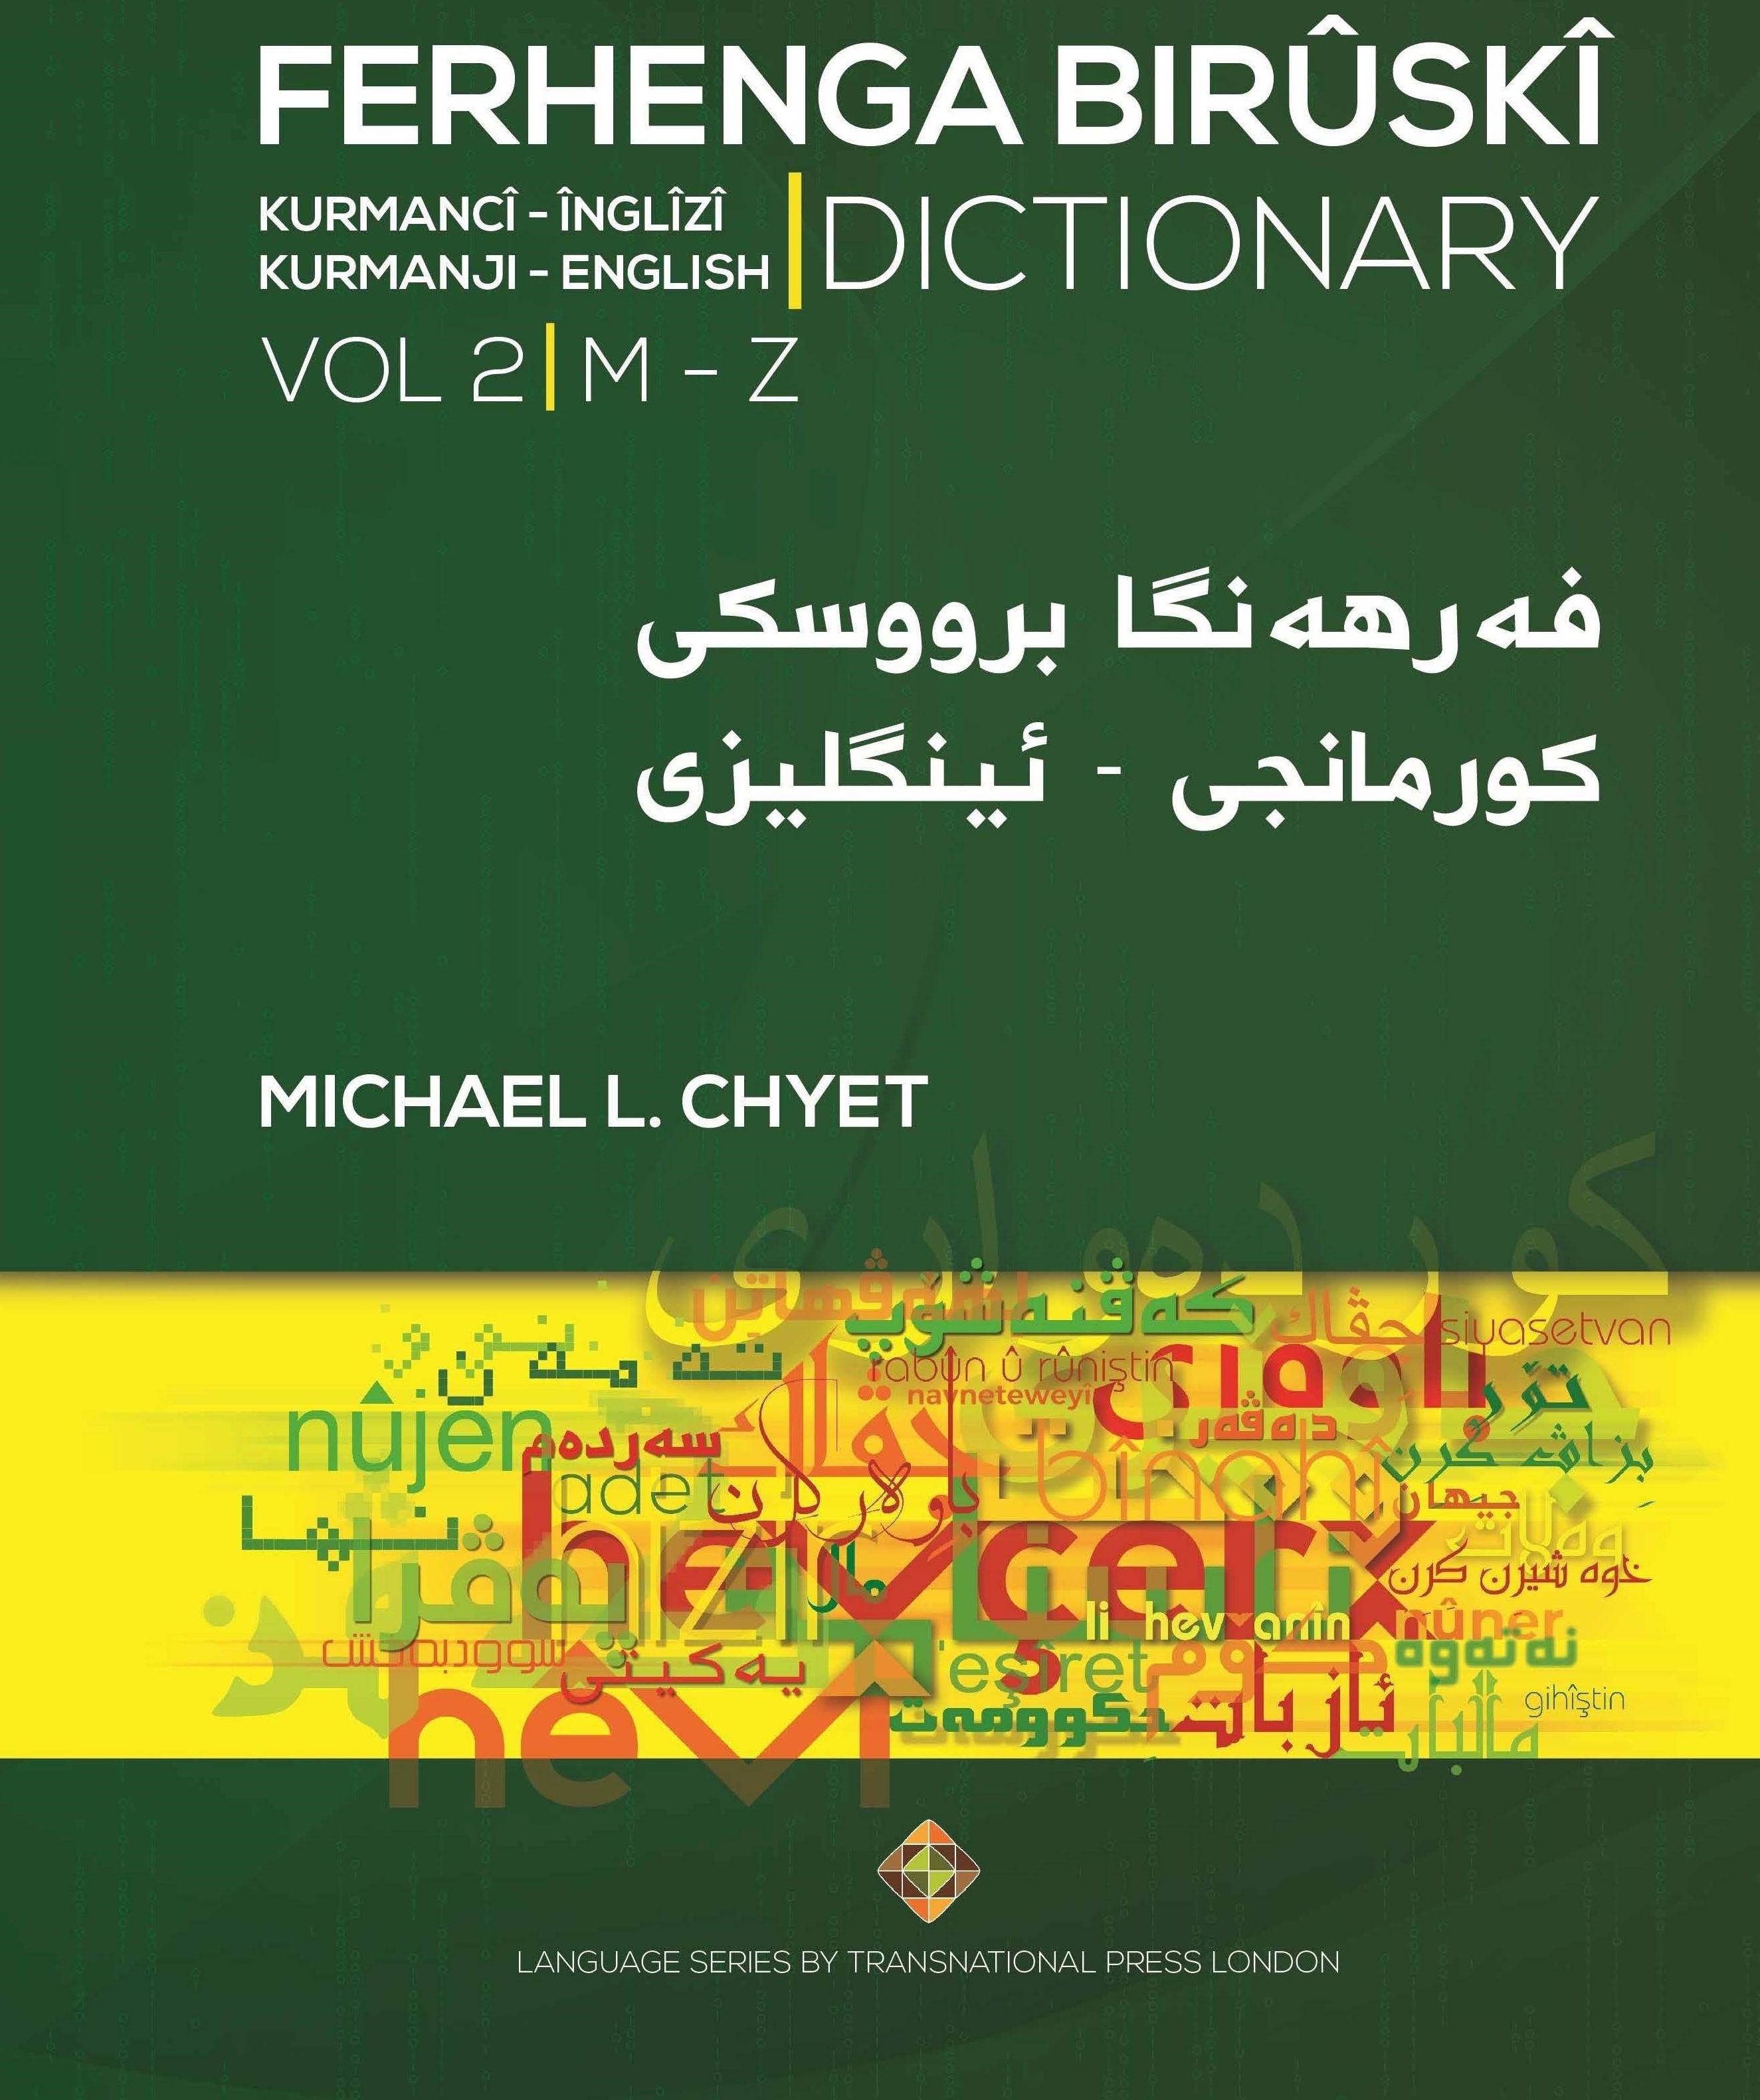 Ferhenga Bırûskî Kurmanji – English Dictionary Volume Two M - Z